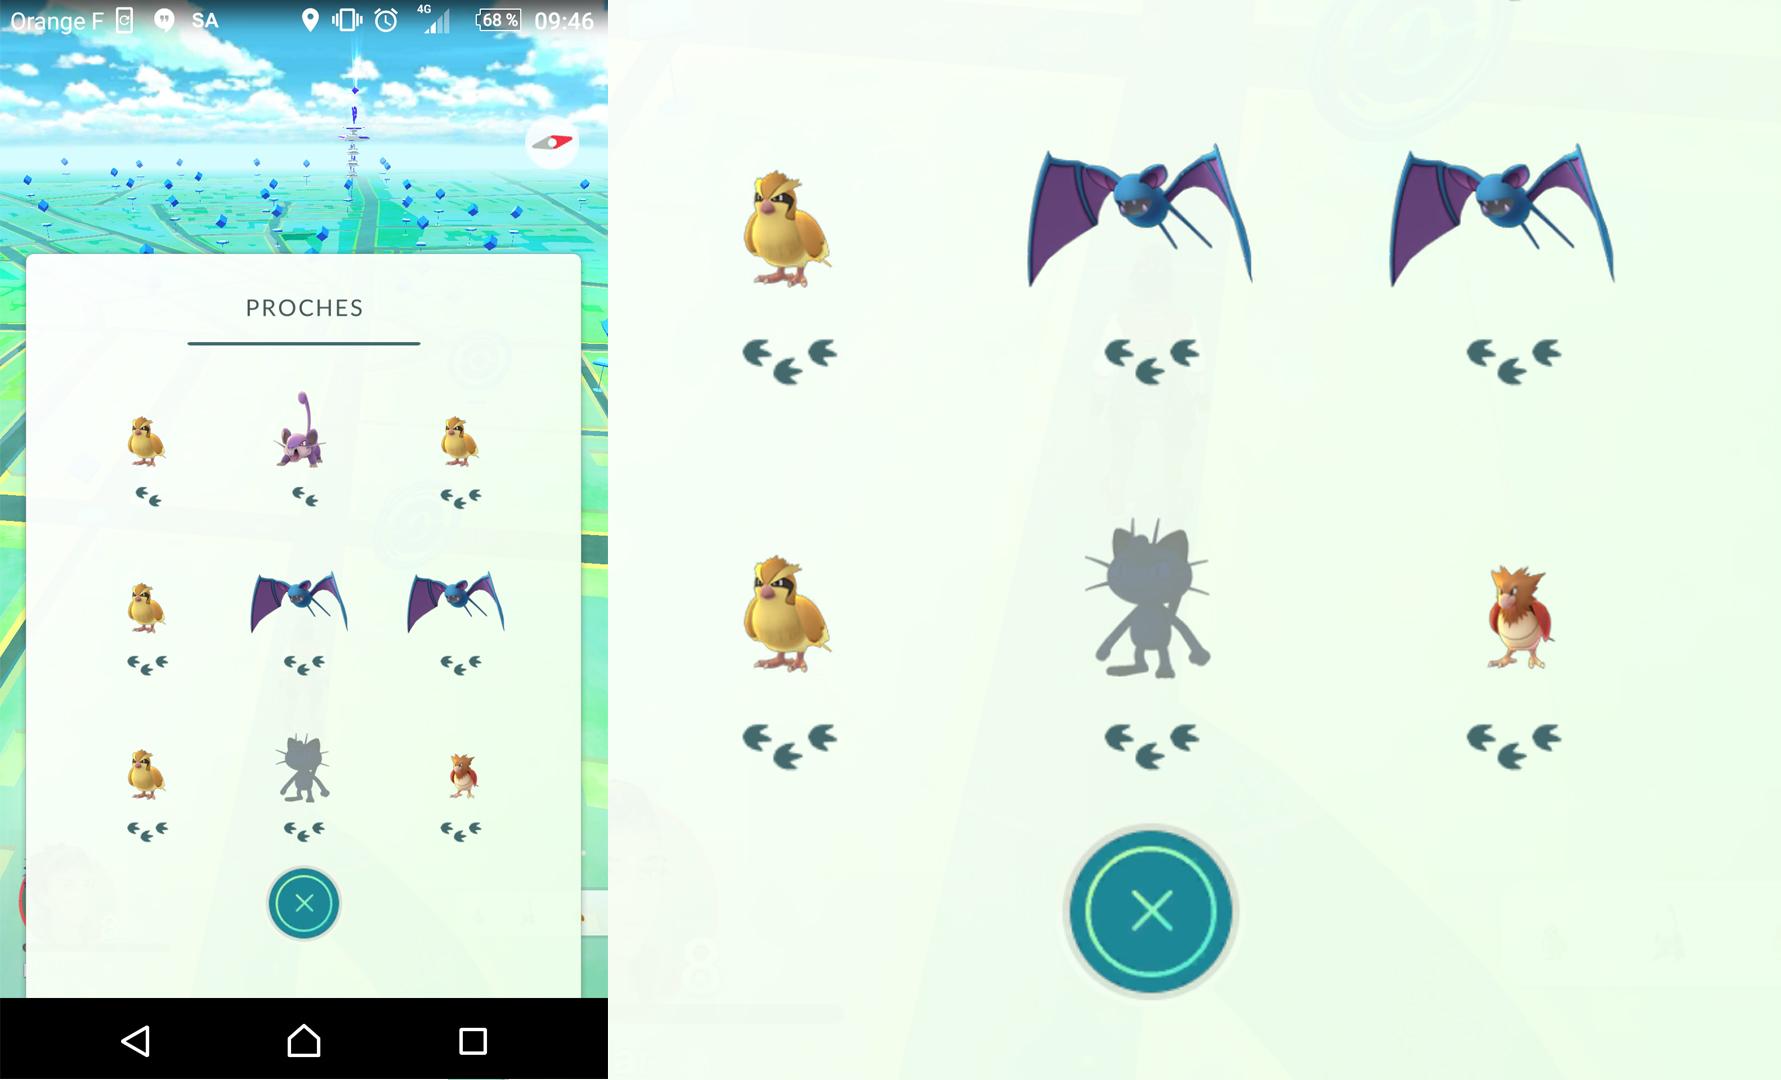 Proches pokémon Go